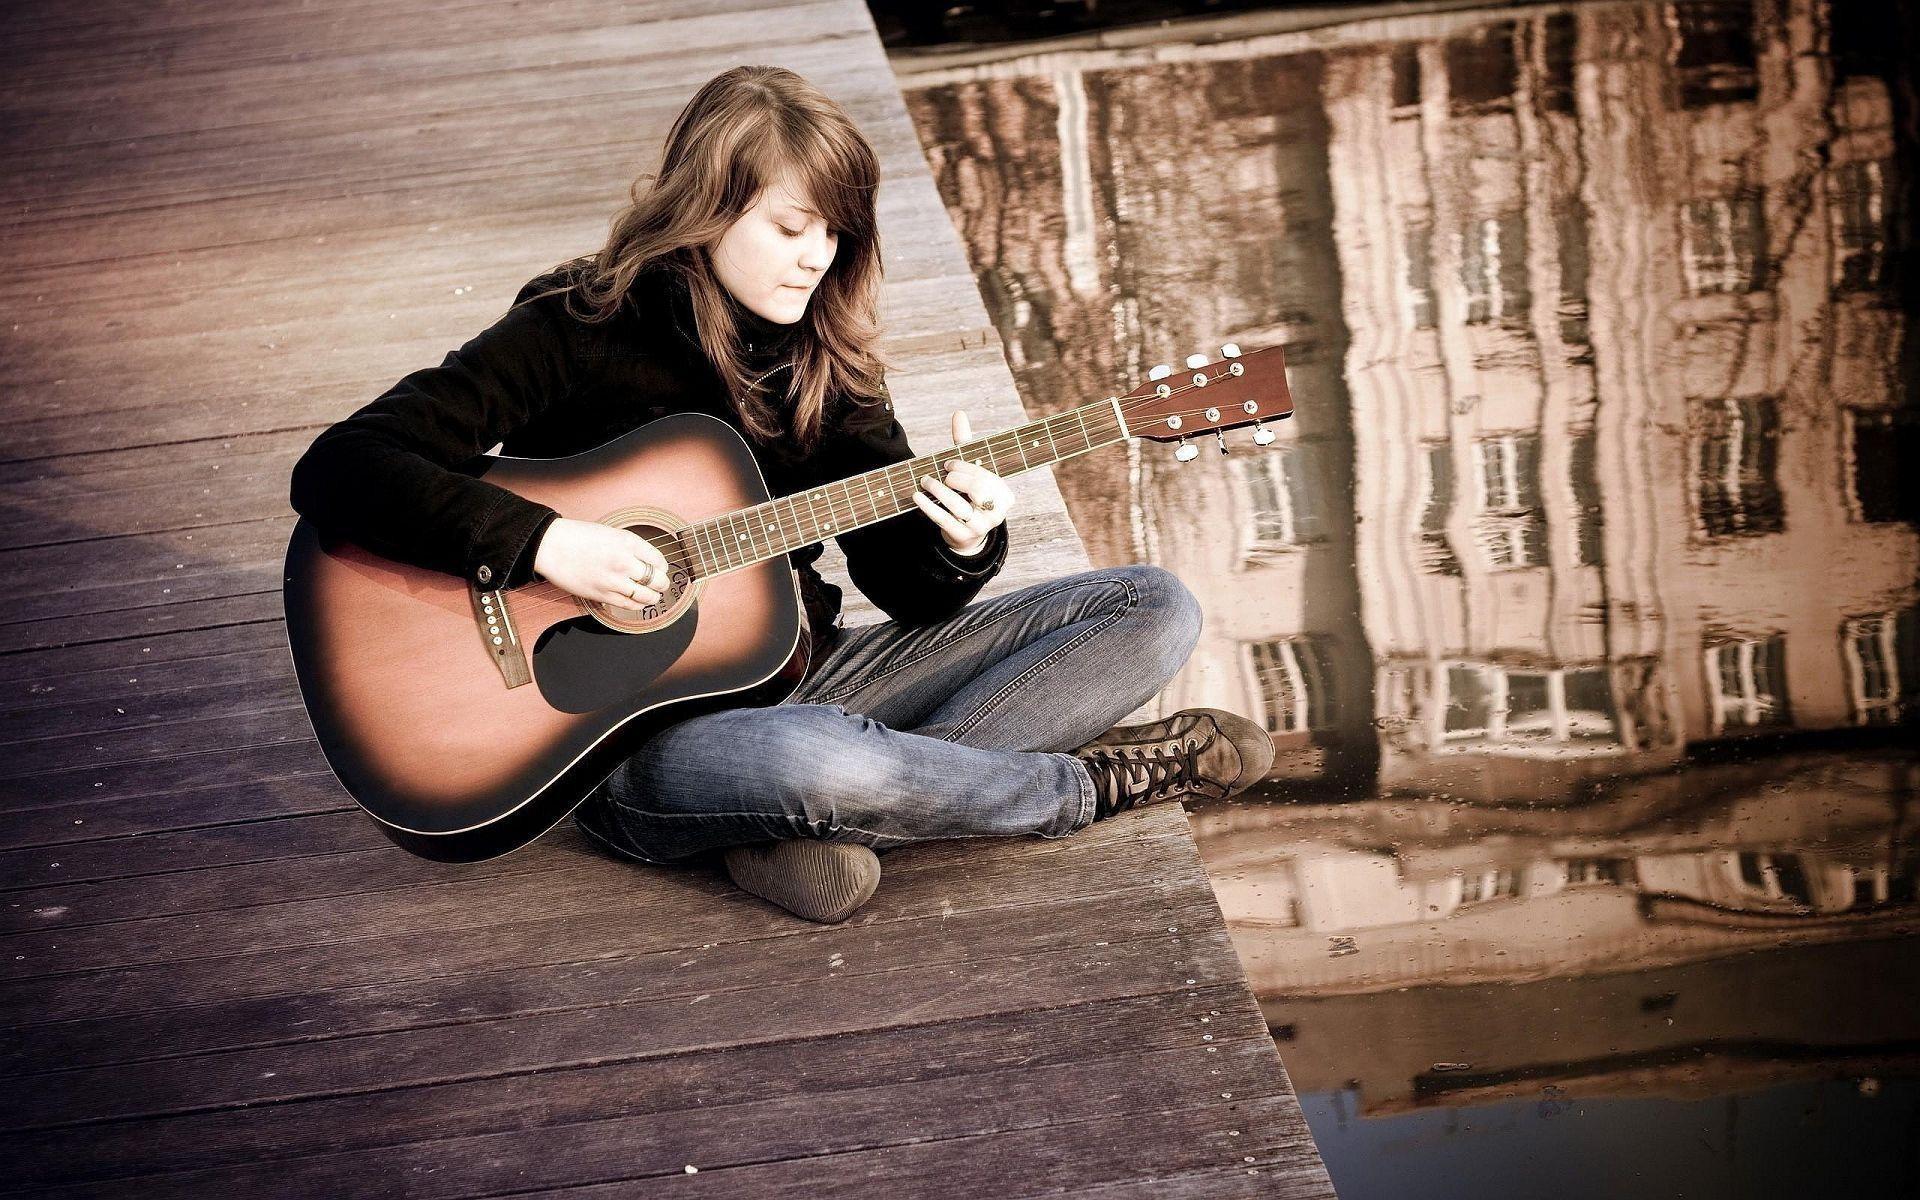 Res: 1920x1200, Girl Playing Guitar